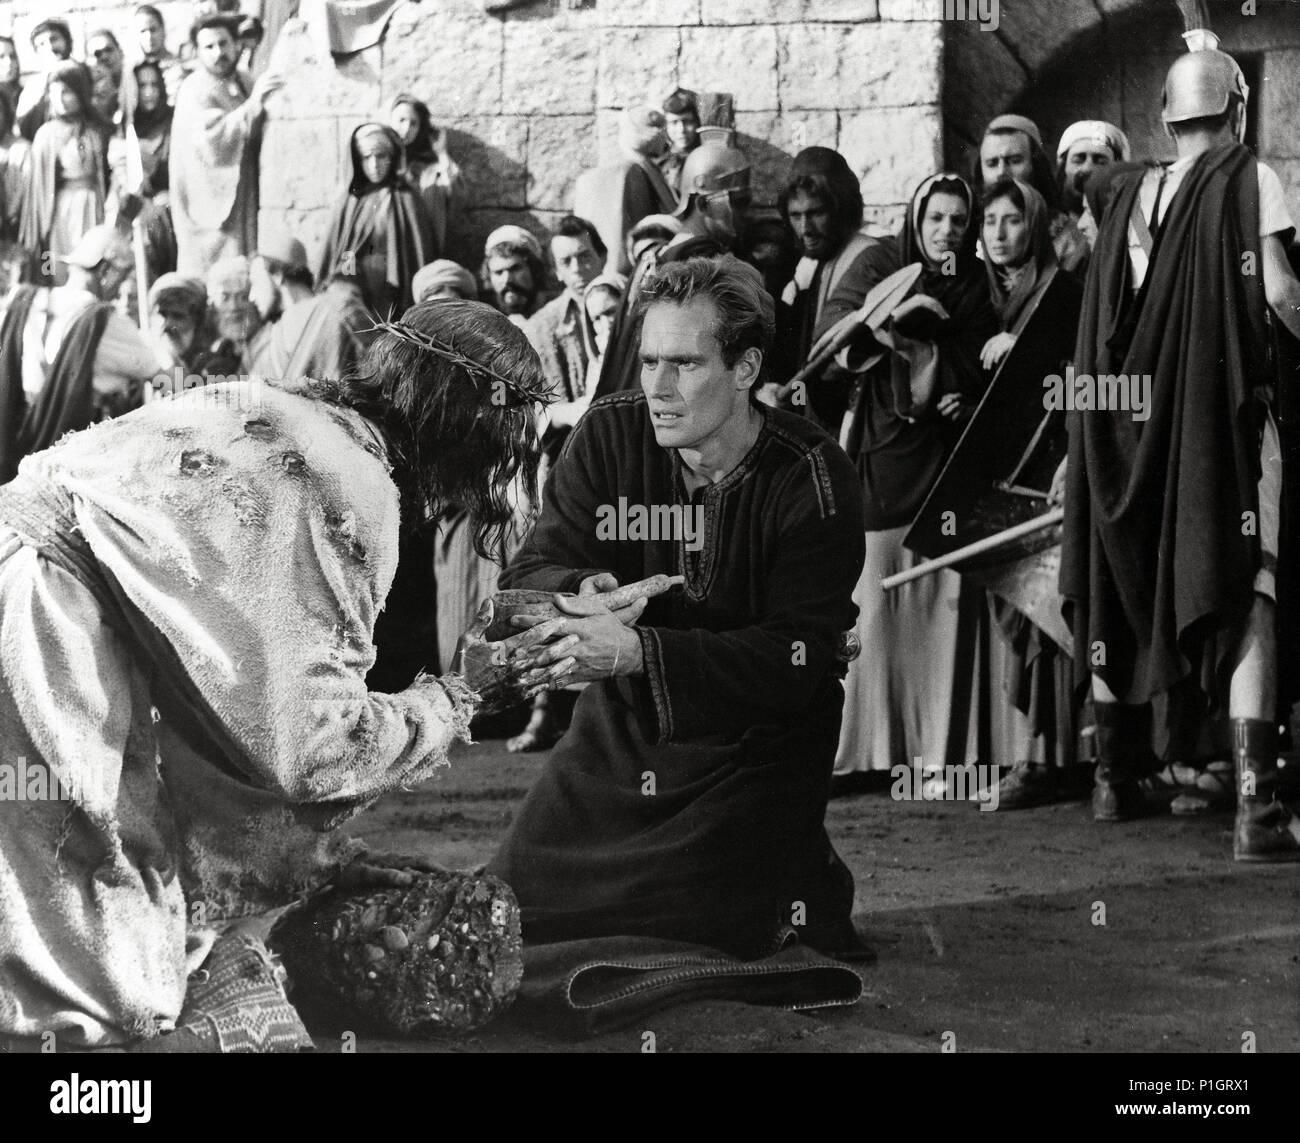 Original Film Title: BEN-HUR.  English Title: BEN-HUR.  Film Director: WILLIAM WYLER.  Year: 1959. Credit: M.G.M. / Album - Stock Image